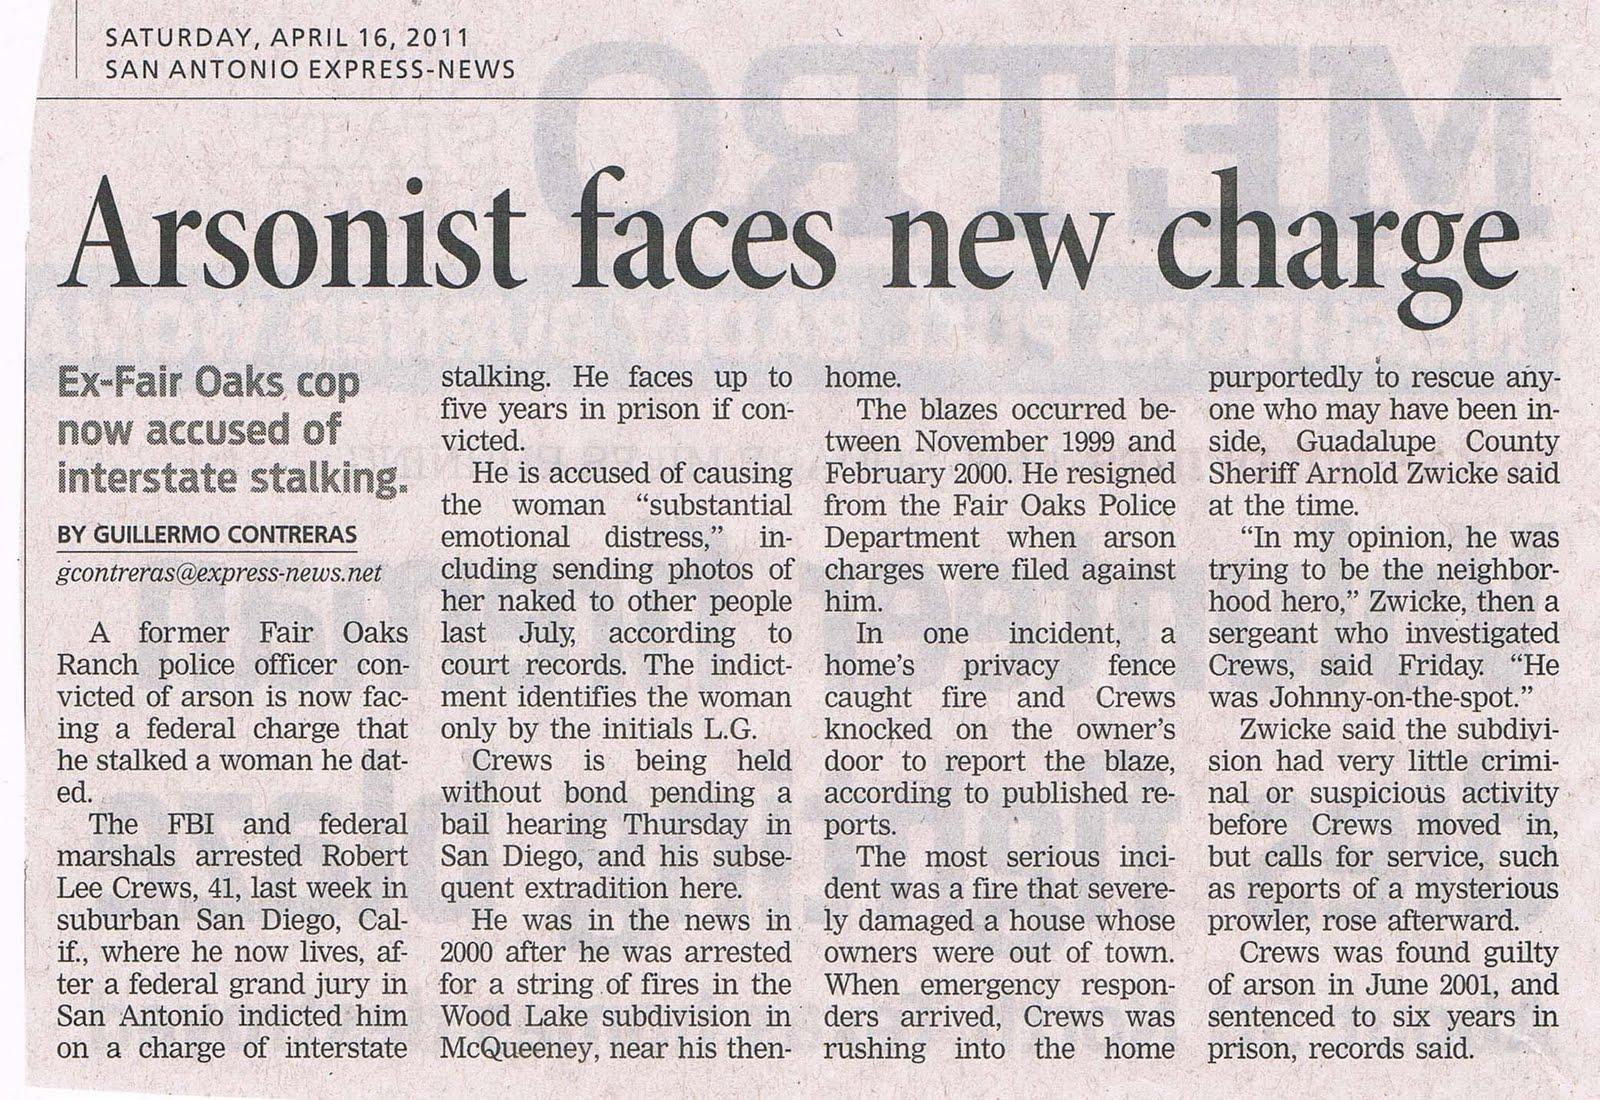 article upon prepared crime